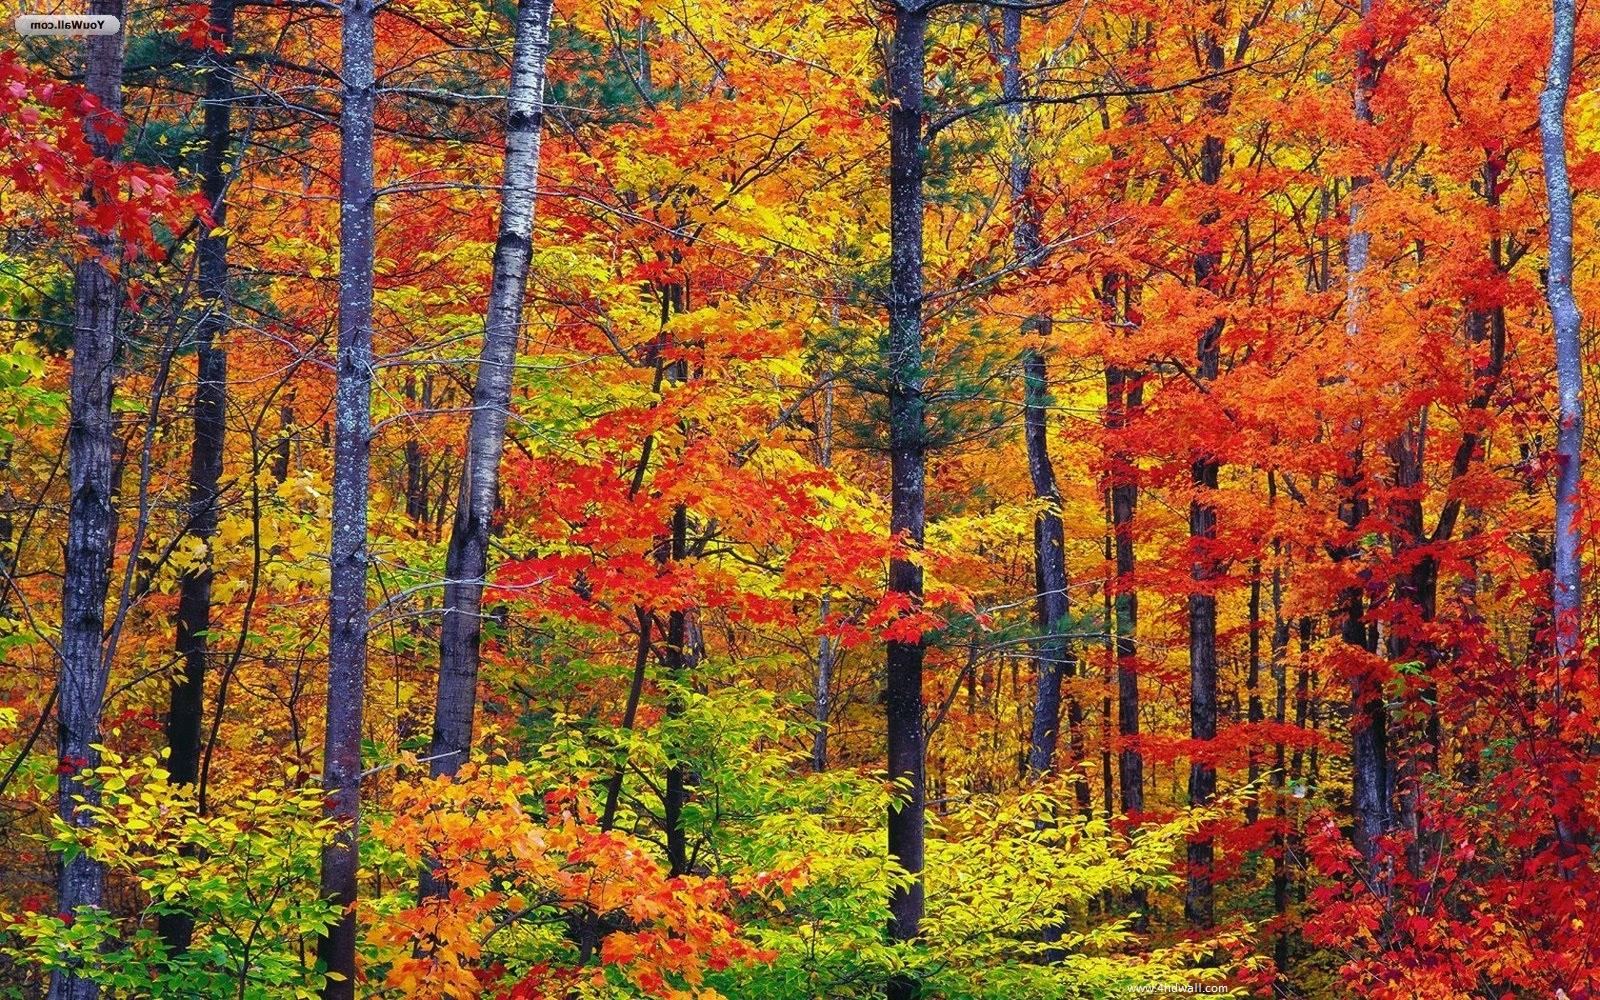 Free Download Fall Season Desktop Backgrounds Desktop Image